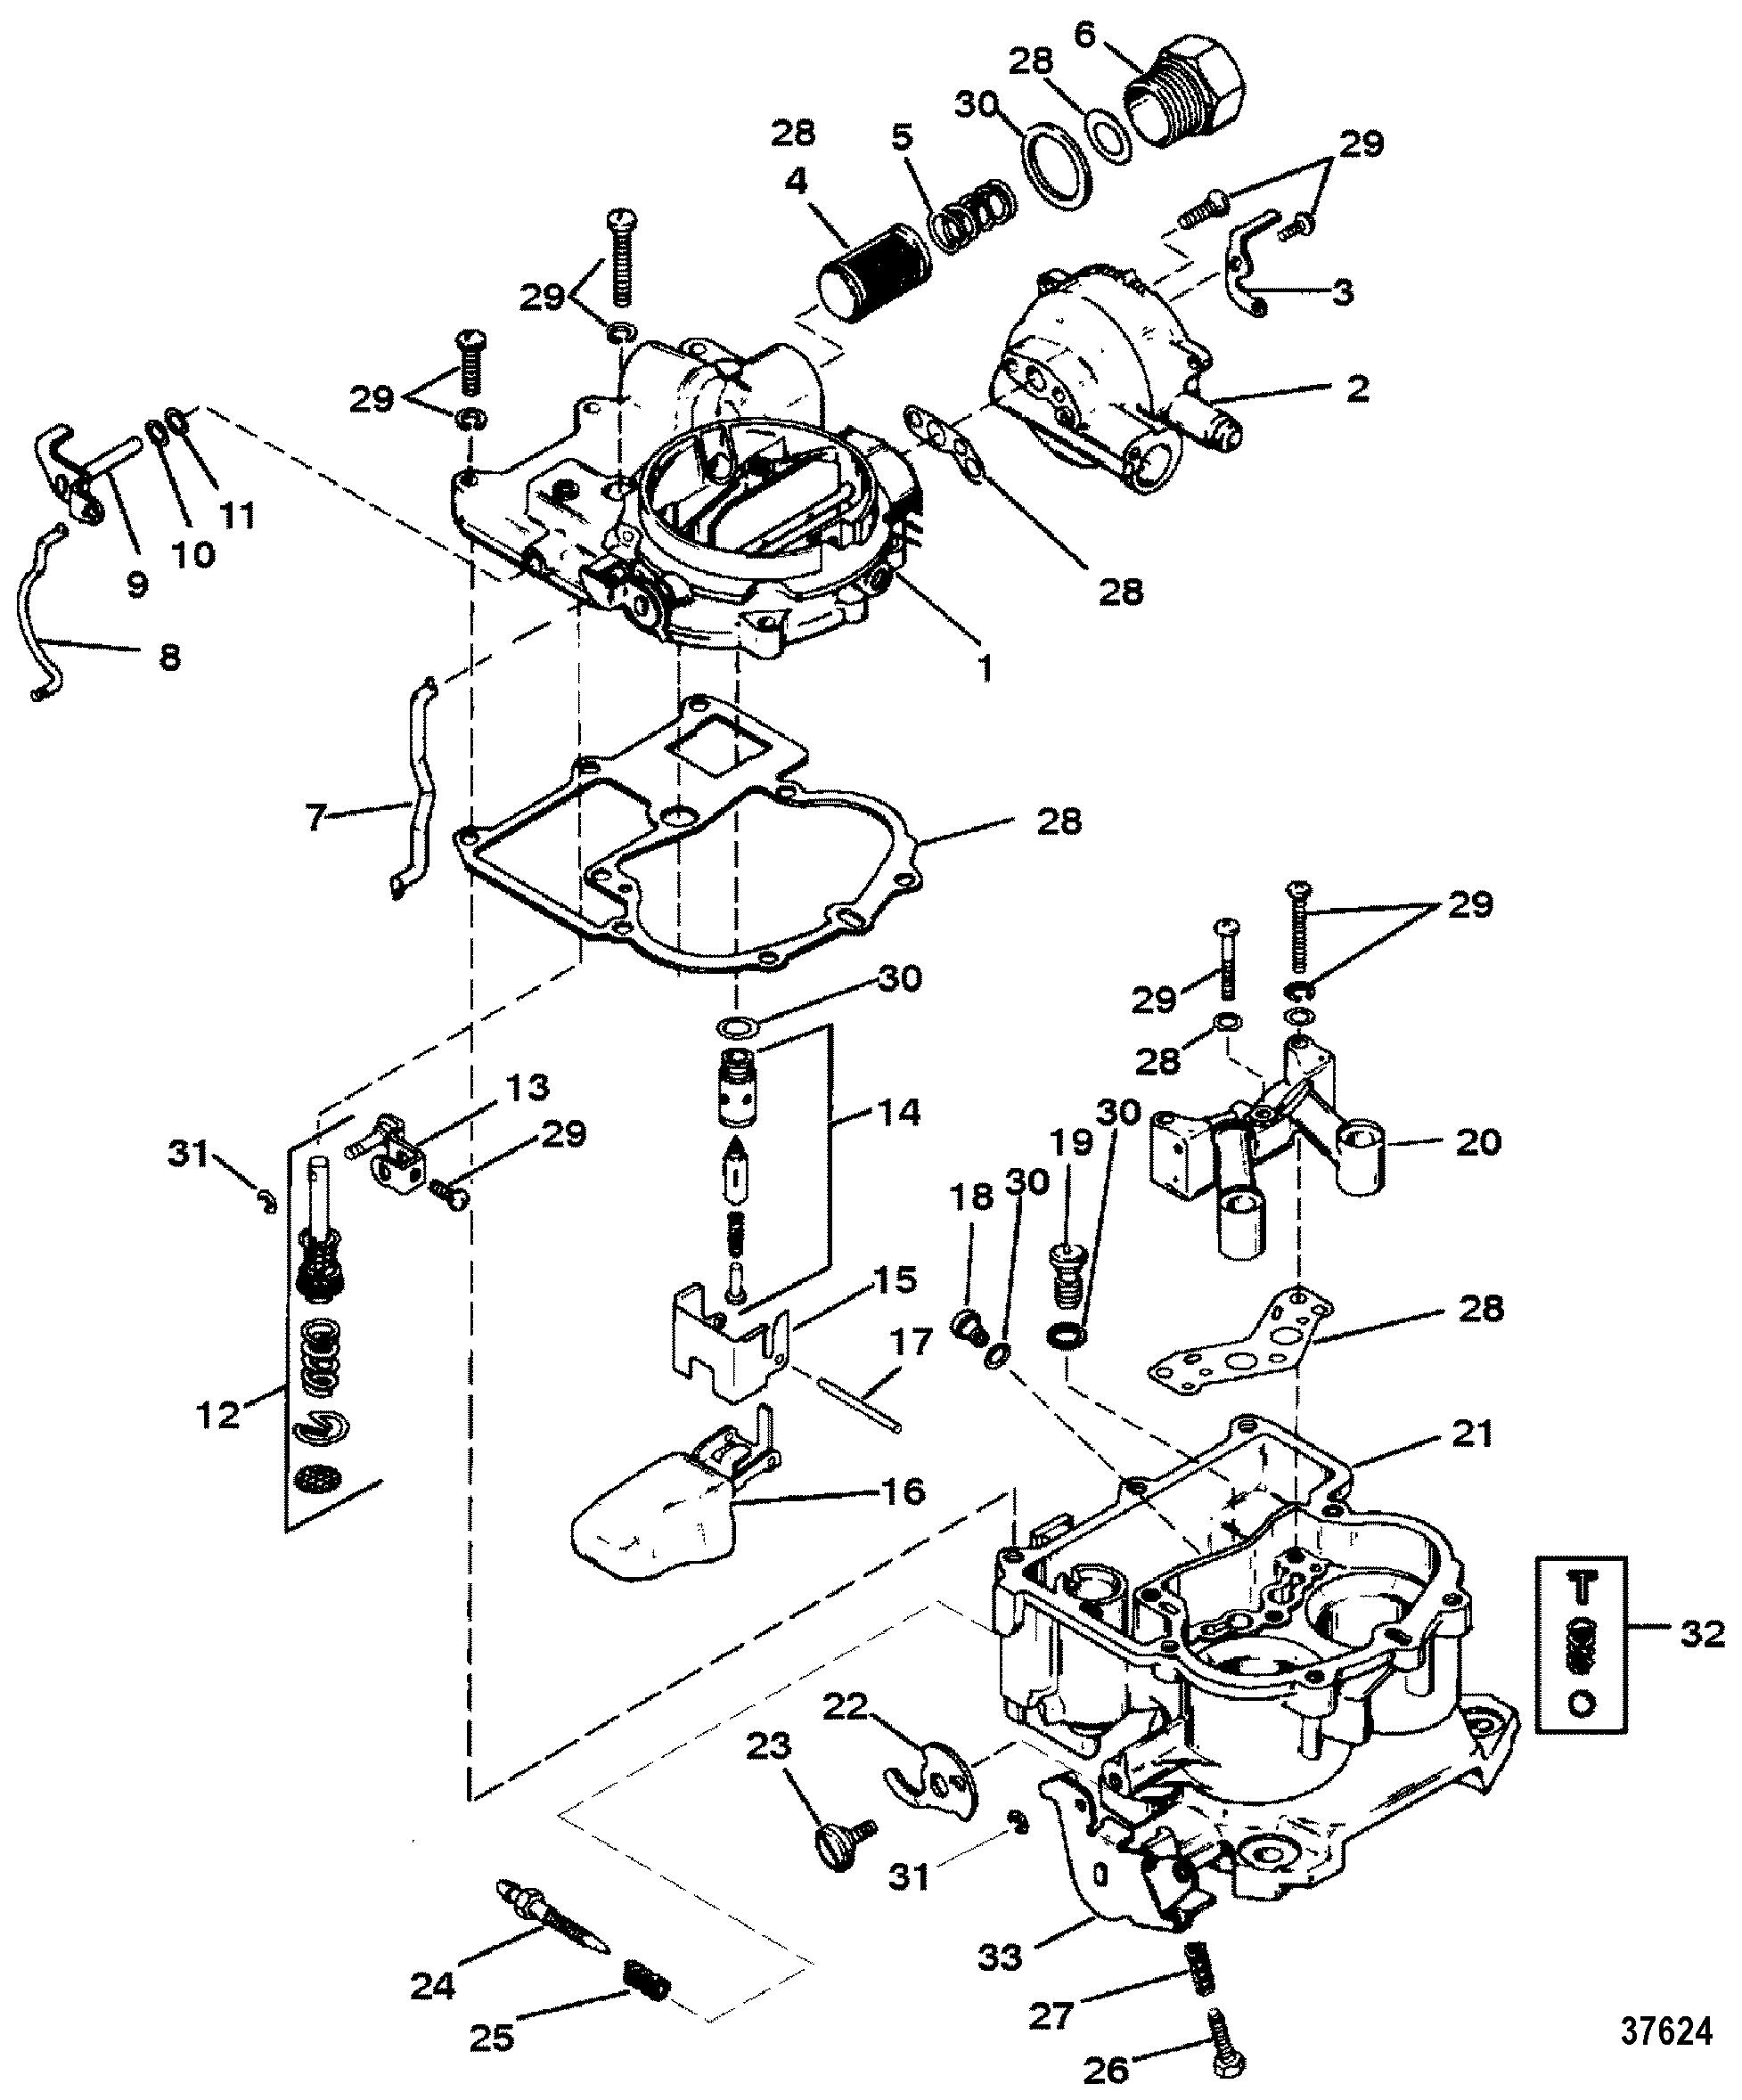 mercruiser wiring diagram 5 7 for trailer lights carburetor mercarb 2 barrel 7l 2bbl